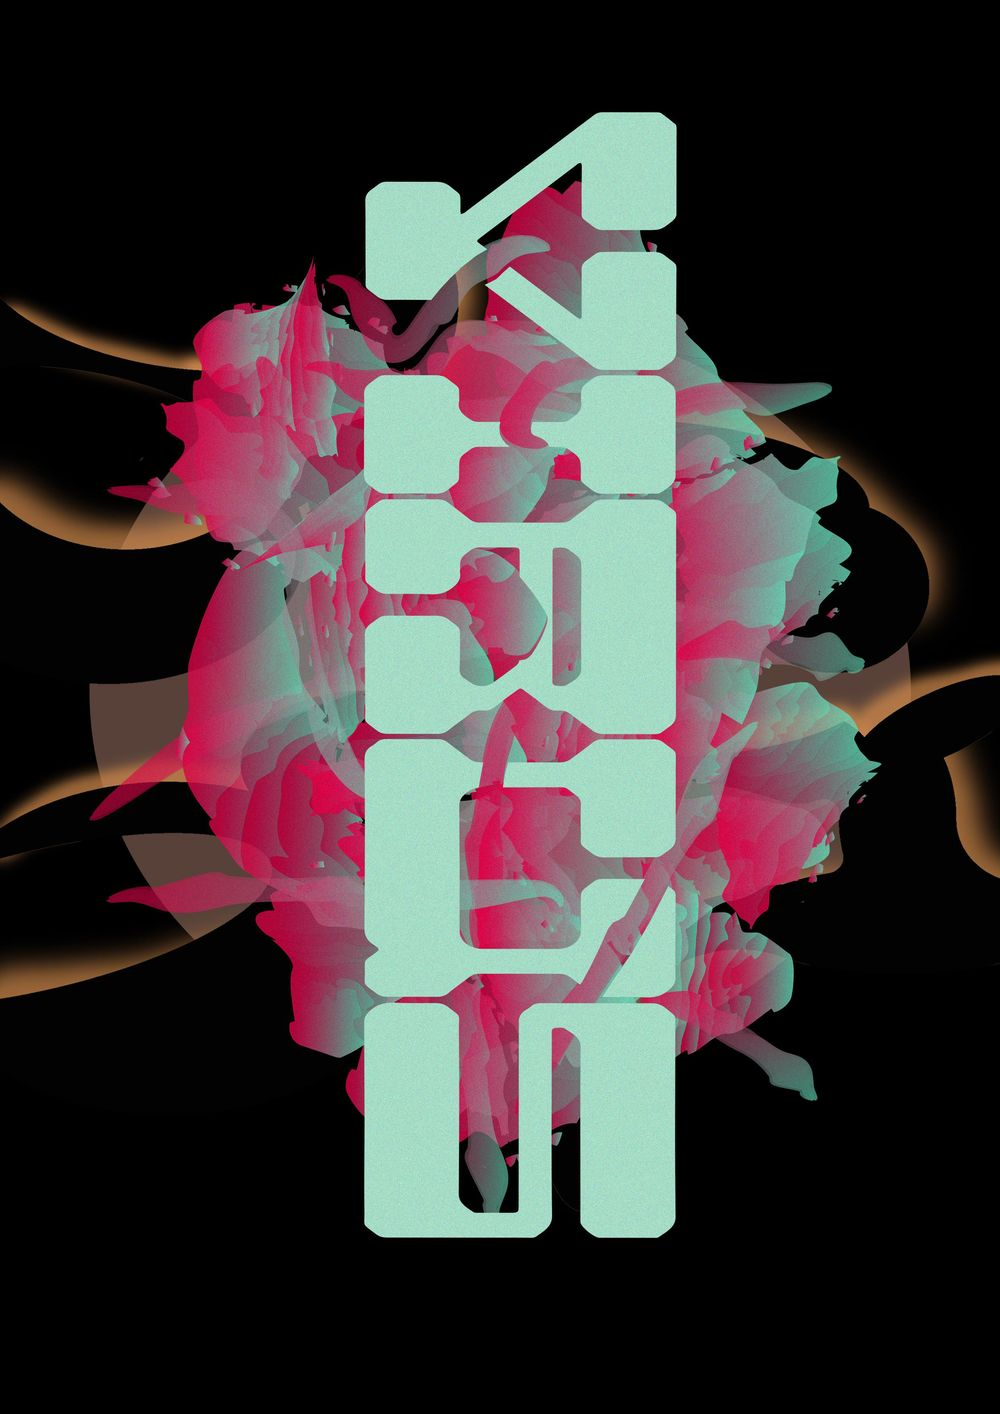 Virus - image 1 - student project